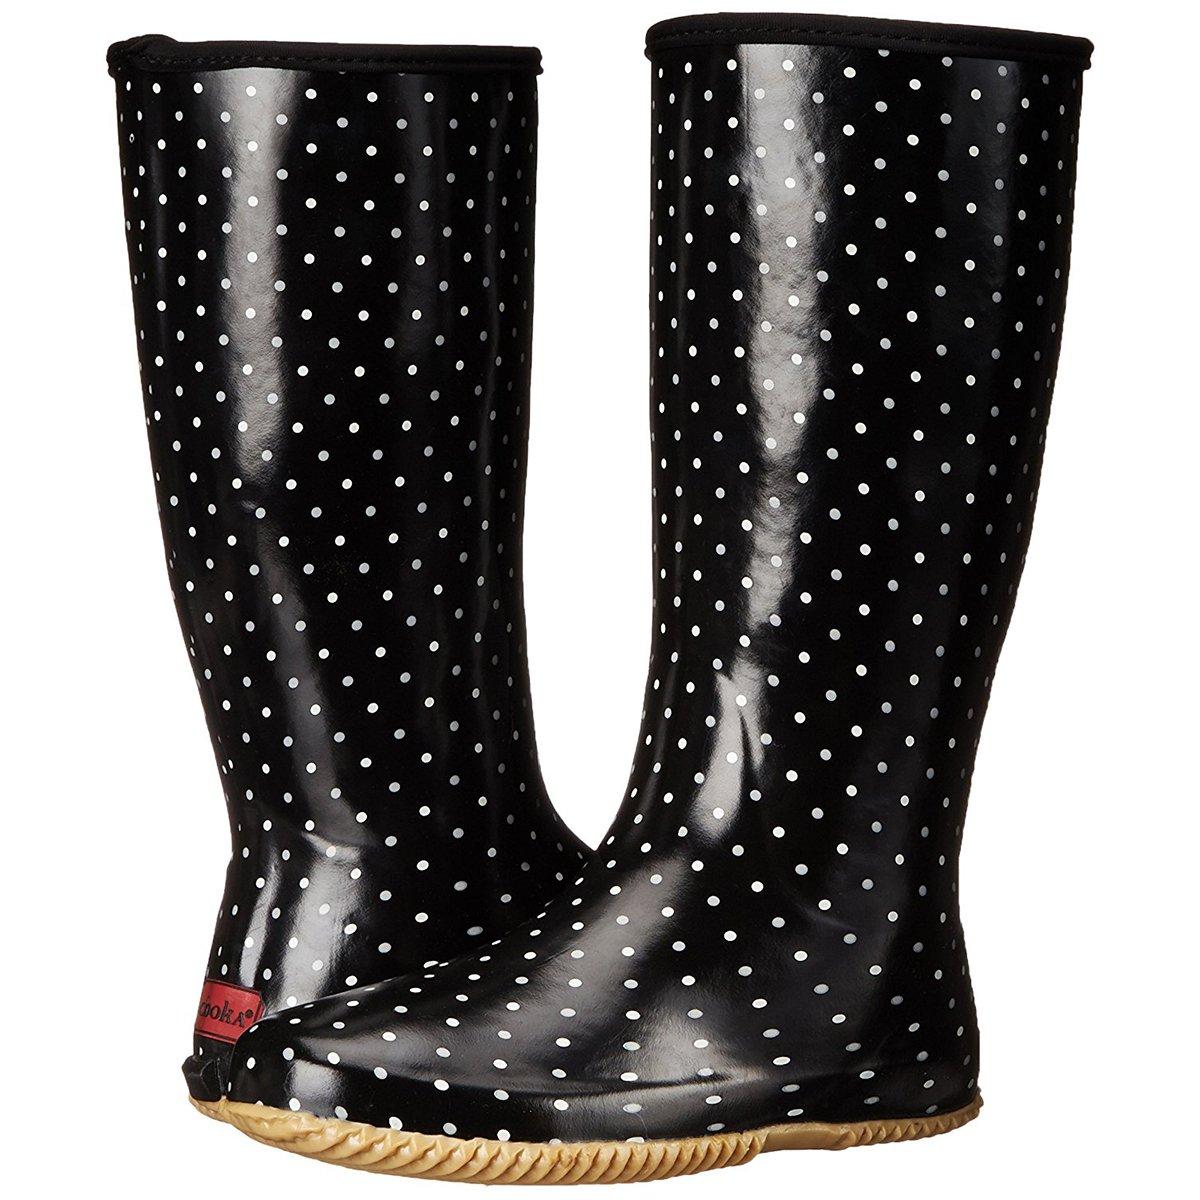 Chooka Women's Packable Rain Boot, Classic Dot Black, 9 M US